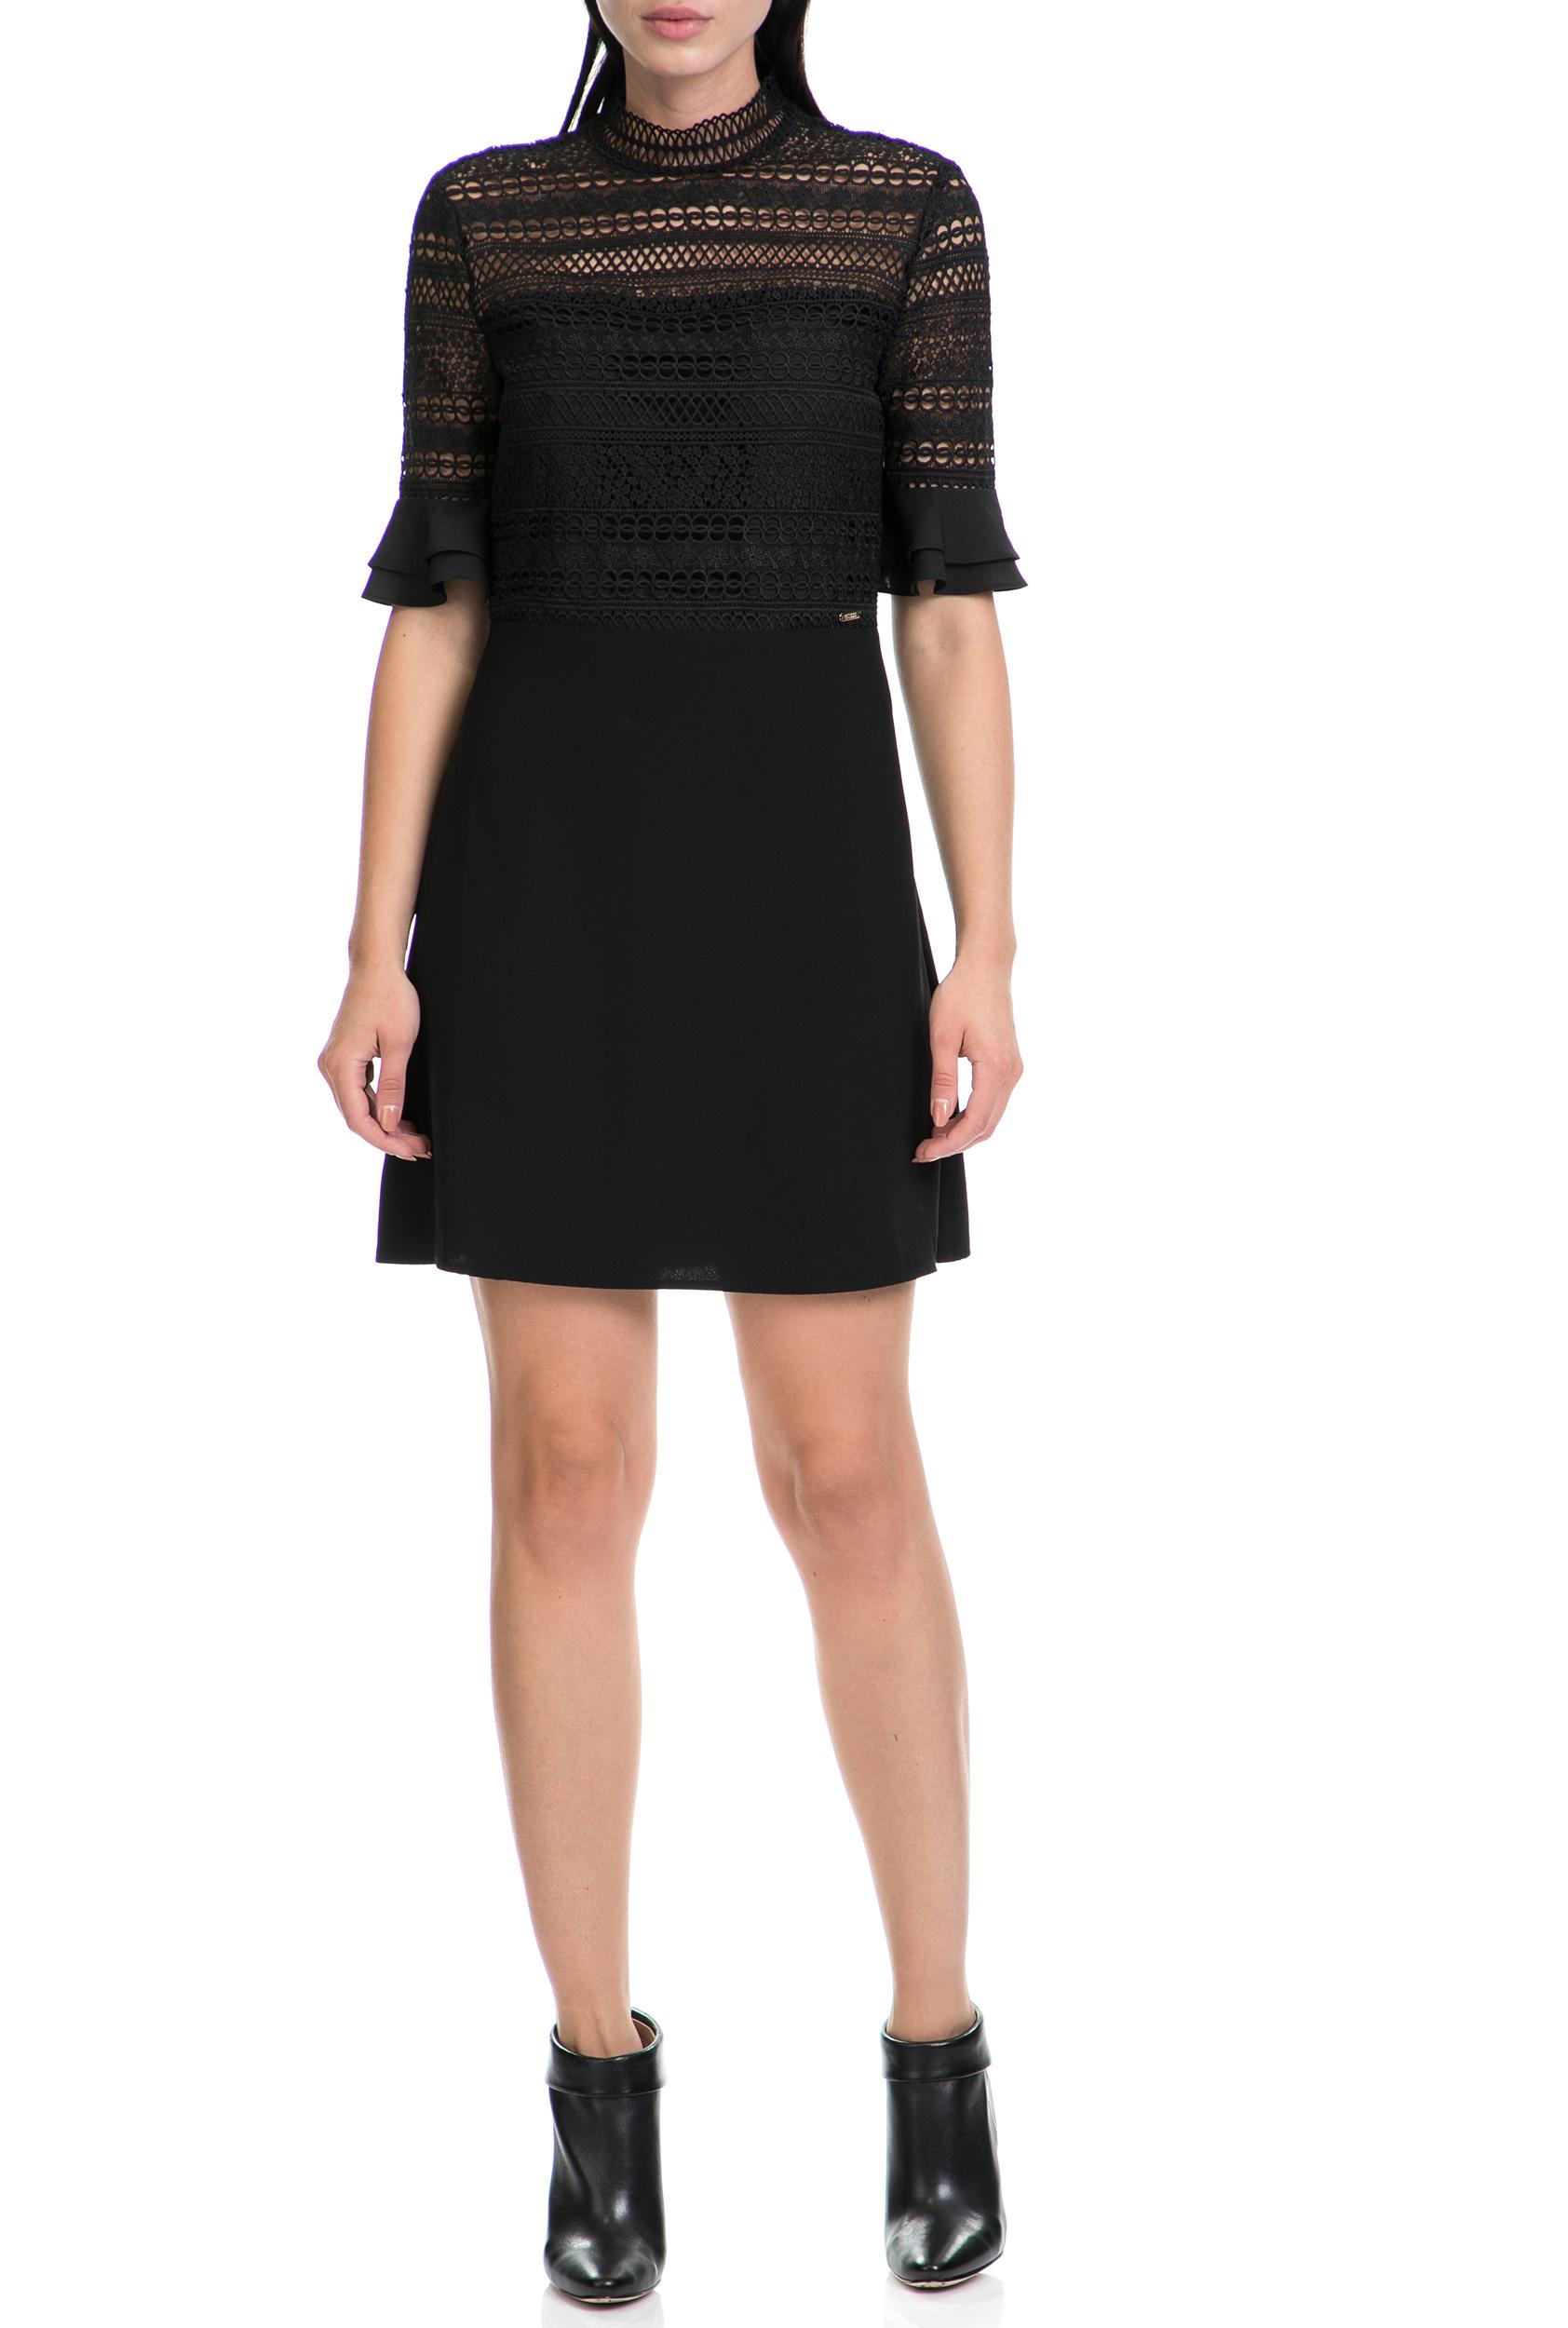 GUESS - Γυναικείο φόρεμα EDITH GUESS μαύρο γυναικεία ρούχα φορέματα μίνι